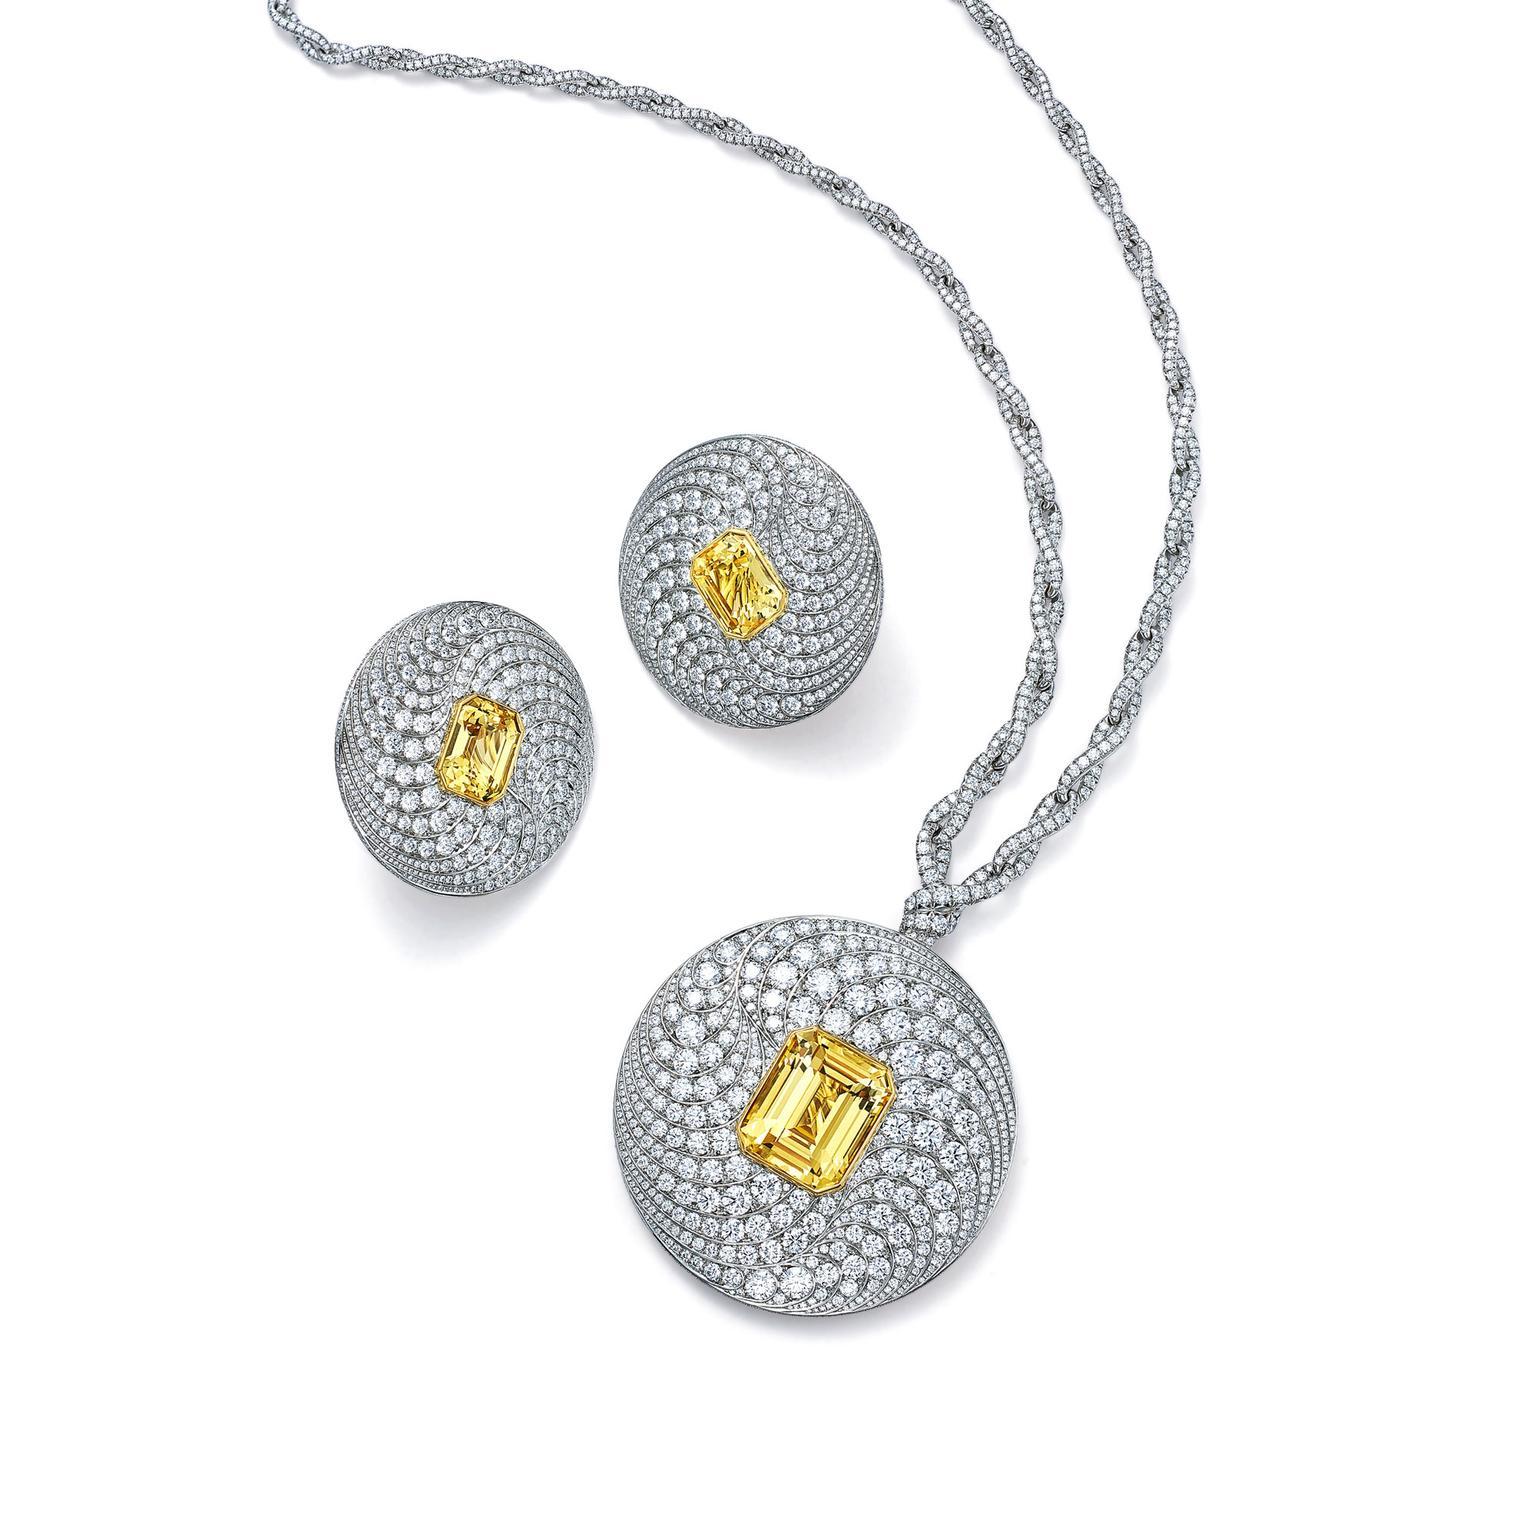 Blue Book yellow diamond cuff and earrings Tiffany & Co